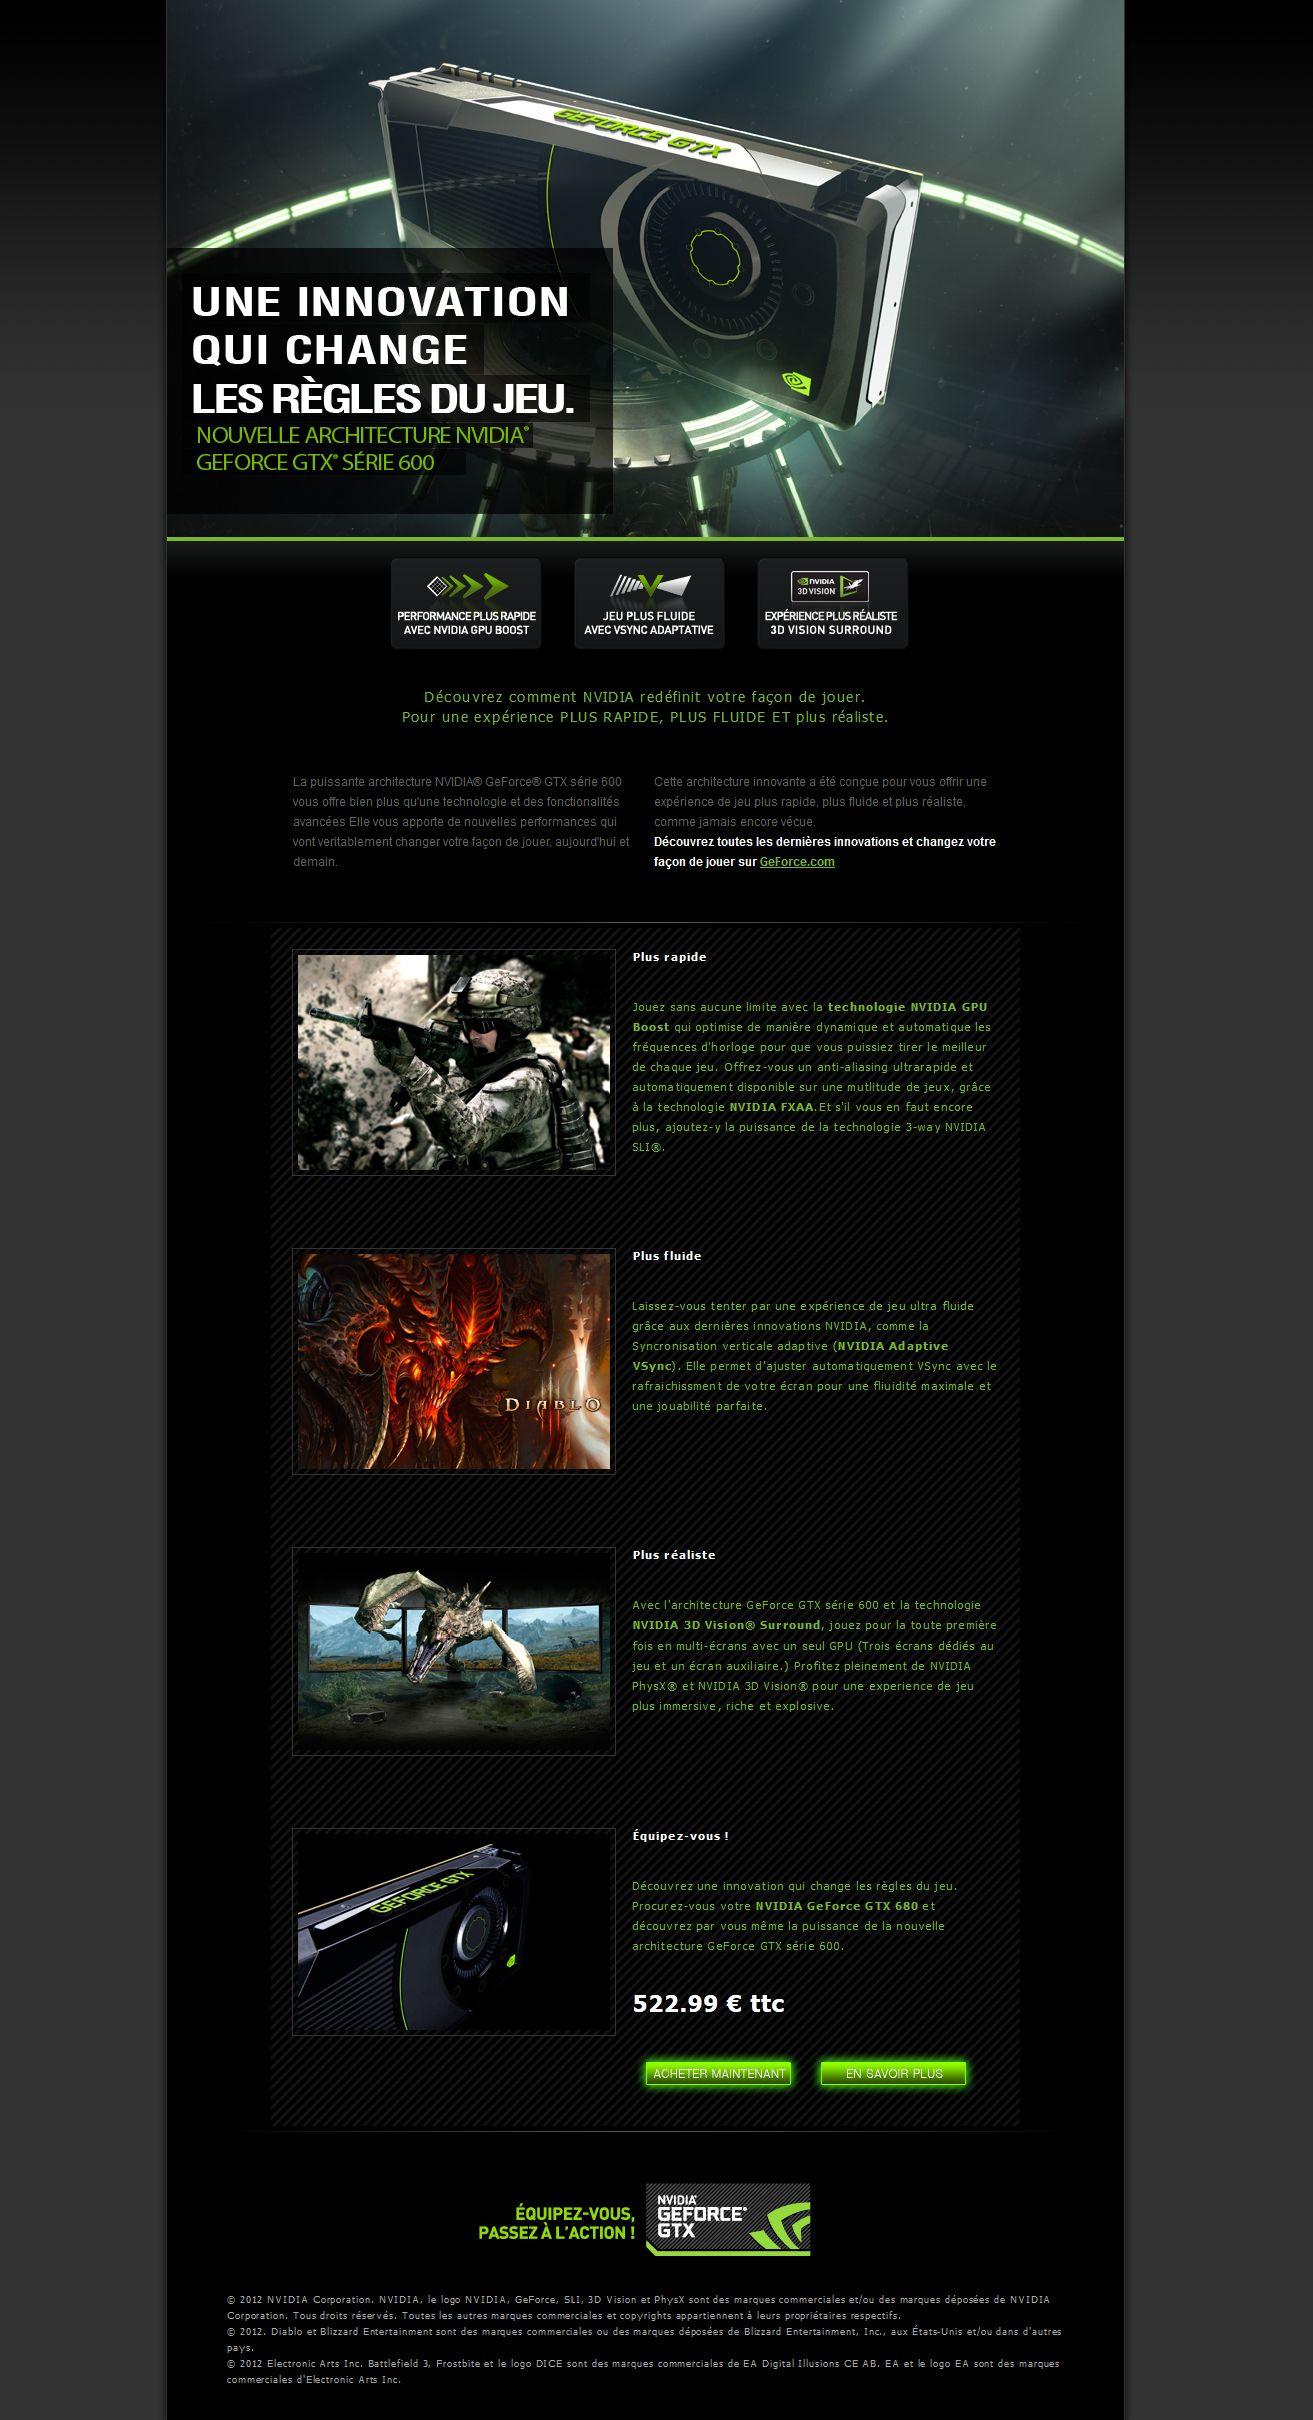 Nvidia Geforce Gtx 680 Campaign Bottom Part Html Css Dotnet Nvidia Css Pandora Screenshot